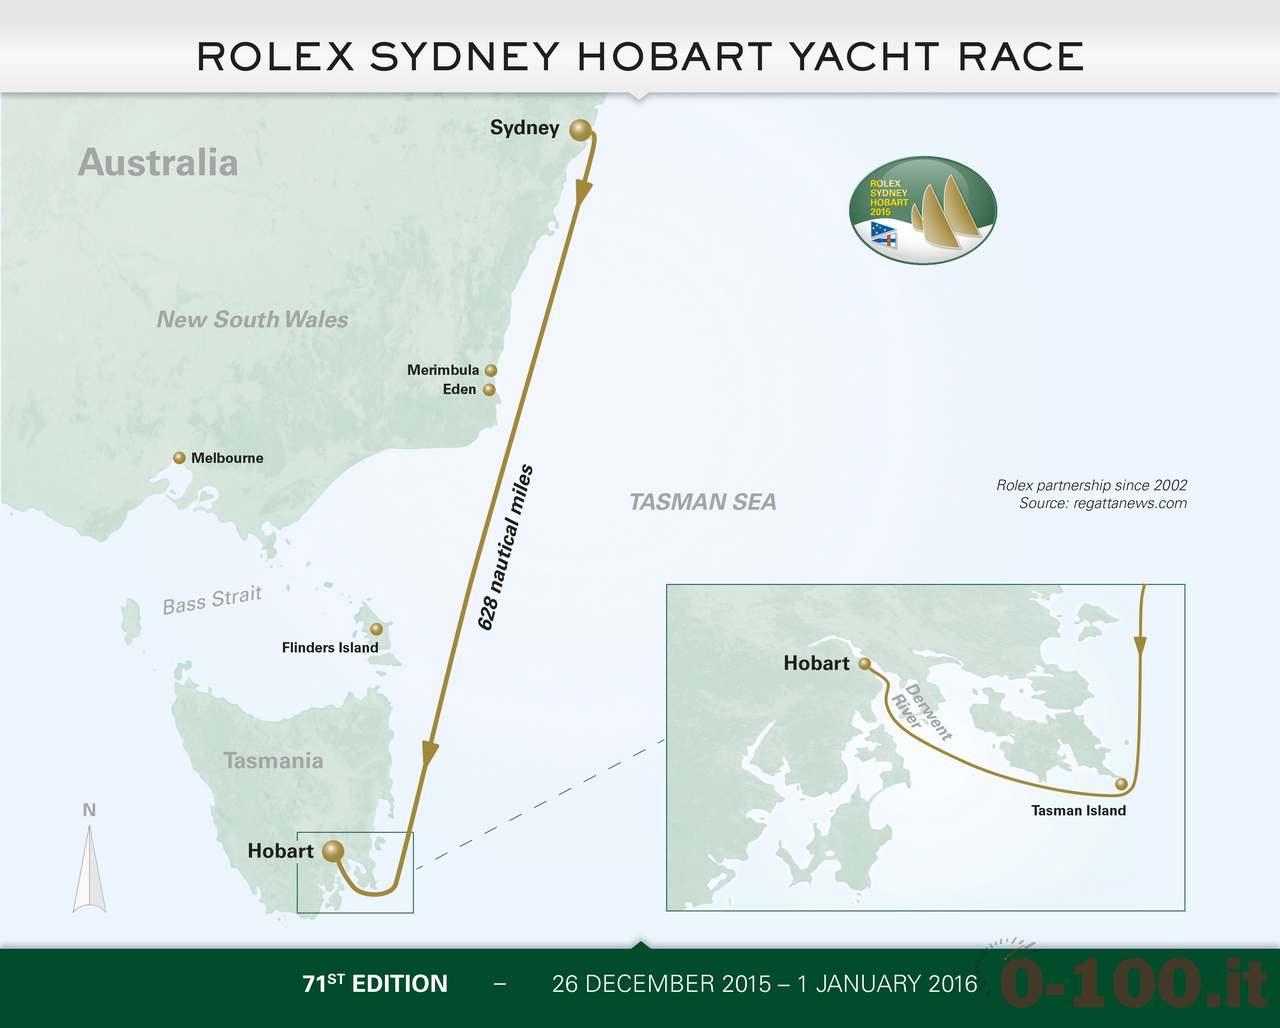 Rolex Sydney Hobart Yacht Race 2015 0 100it